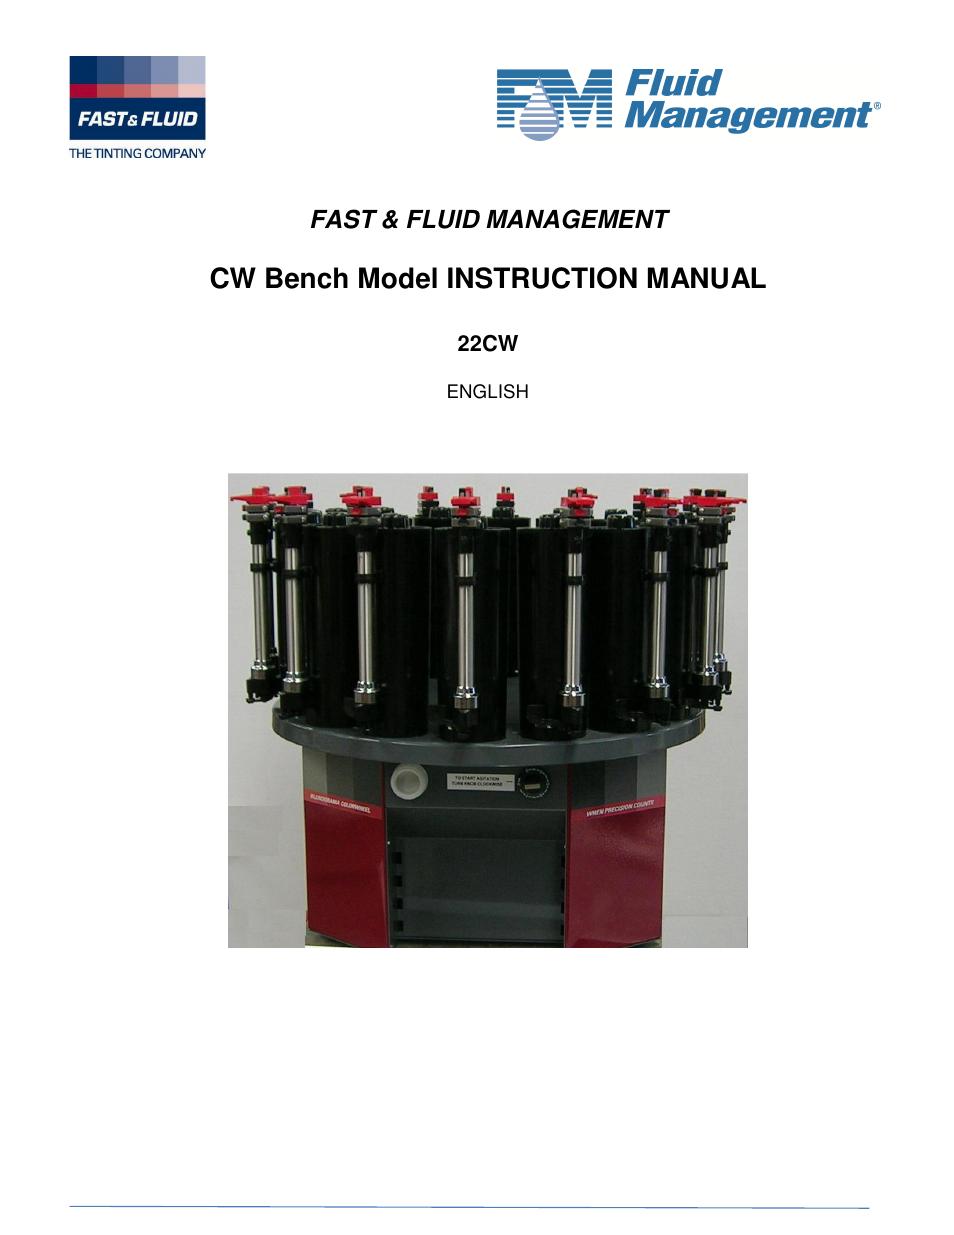 fluid management 22cw blendorama user manual